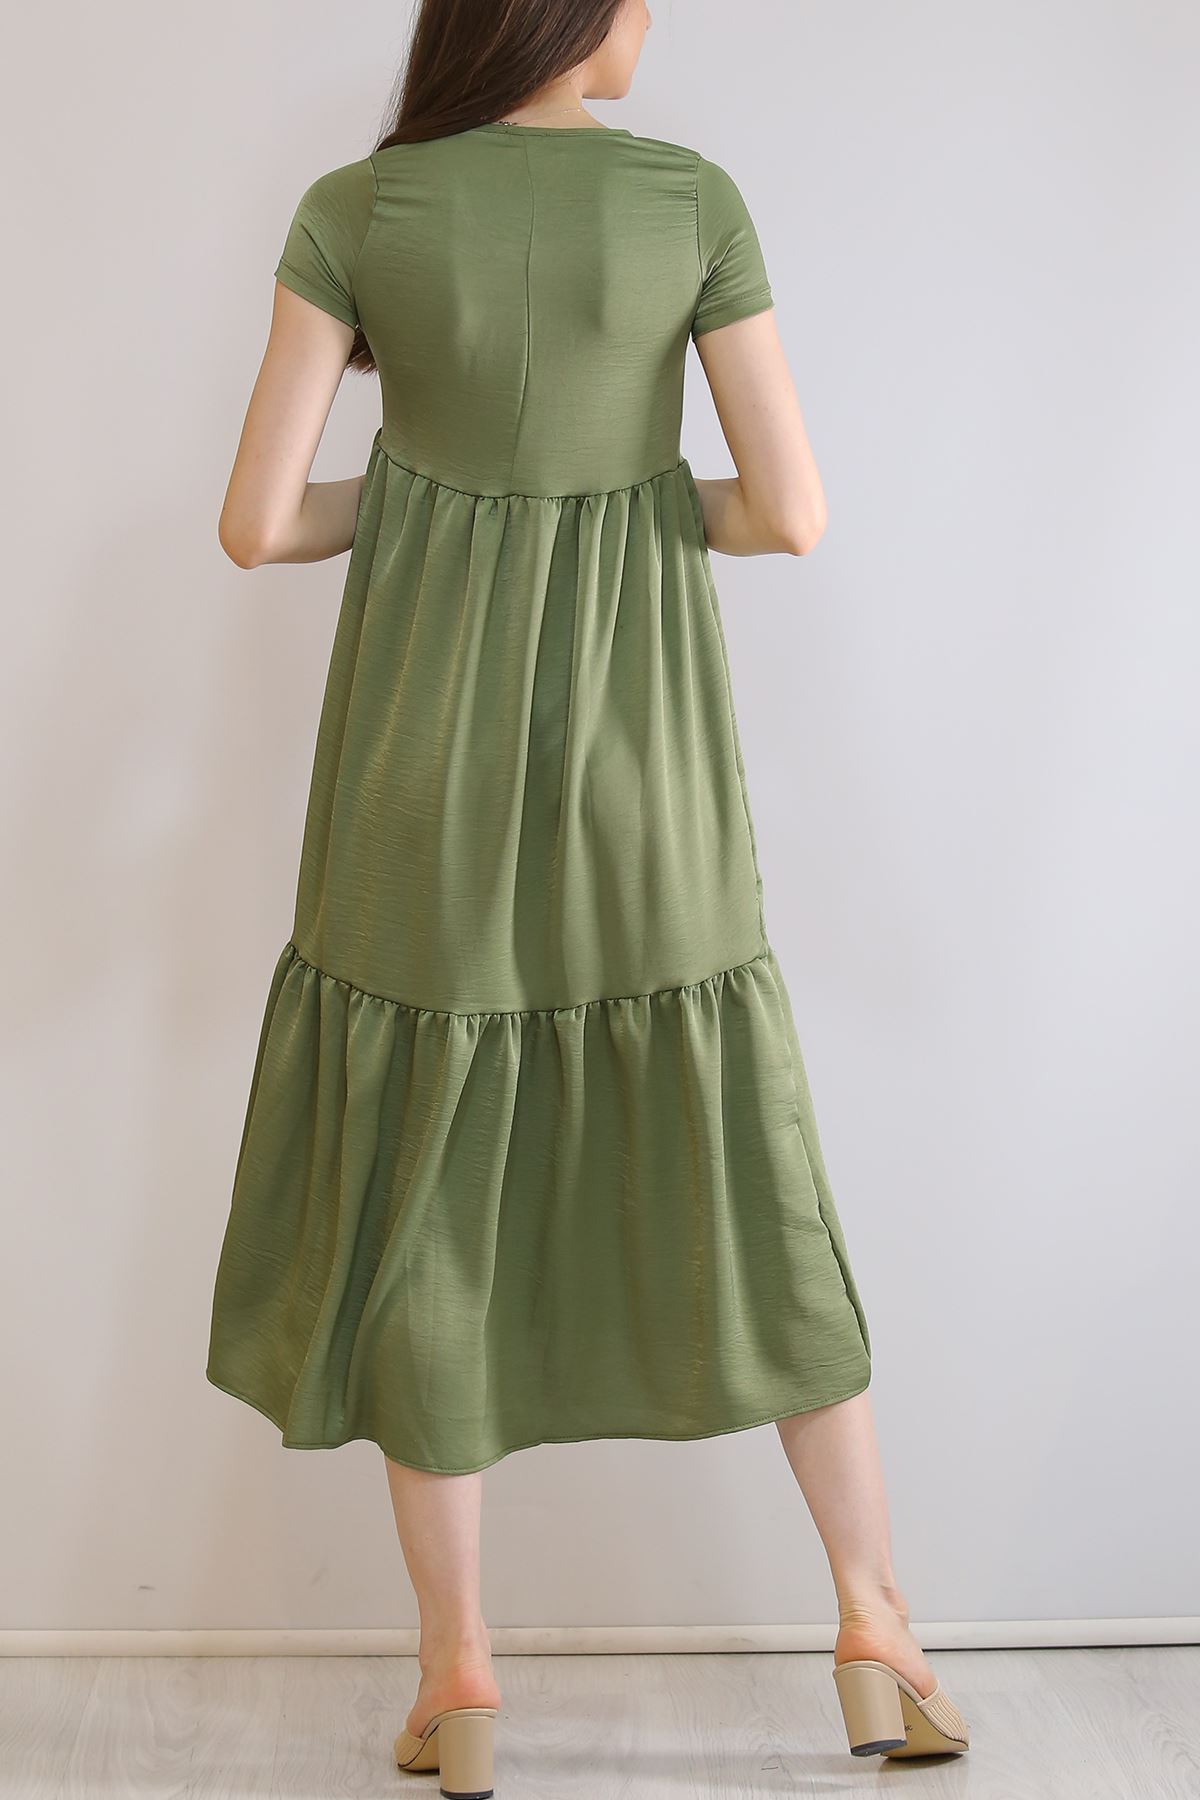 Ayrobin Elbise Mint - 6023.1247.